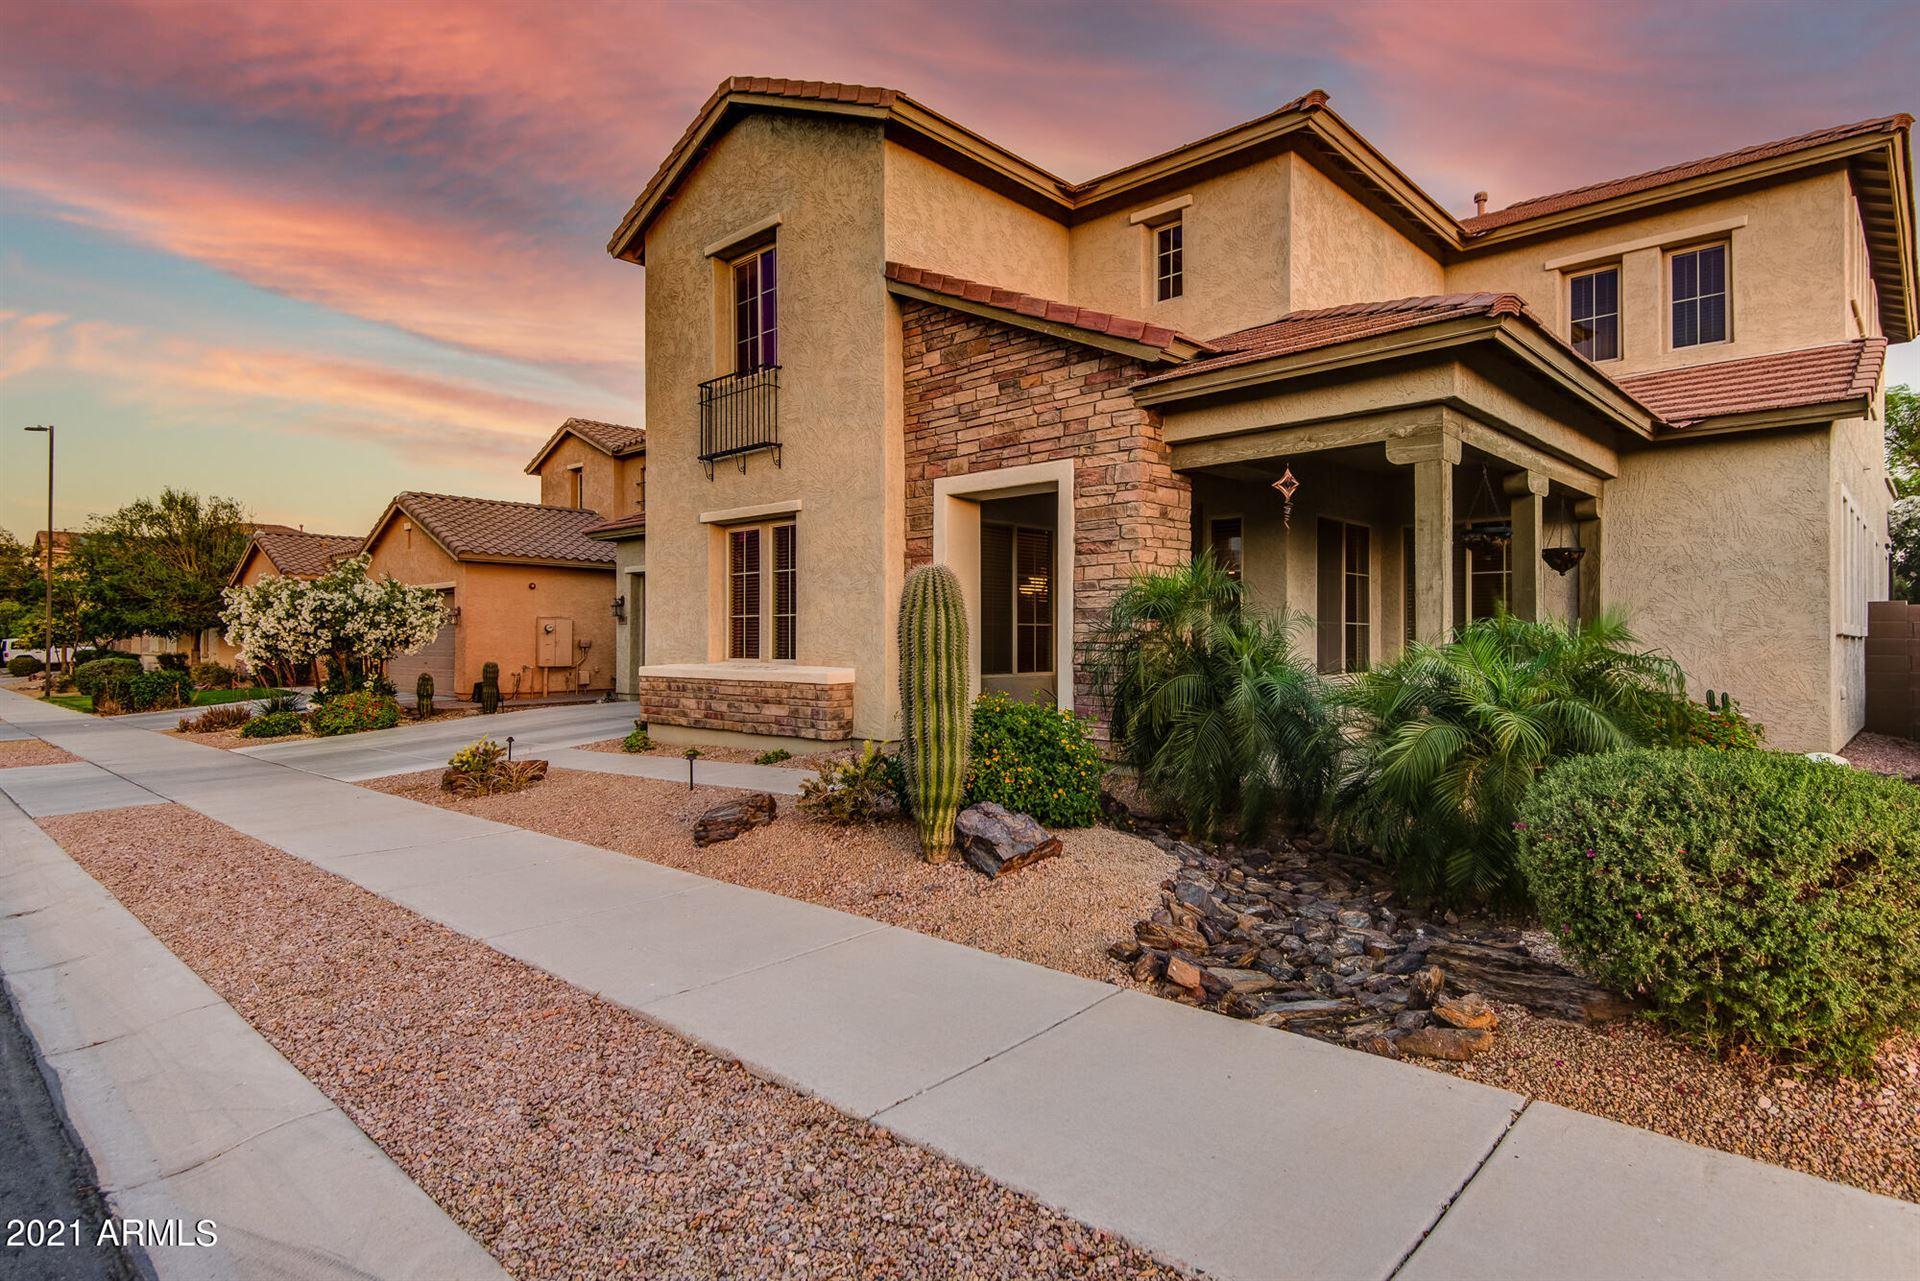 Photo of 17385 W LINCOLN Street, Goodyear, AZ 85338 (MLS # 6231329)